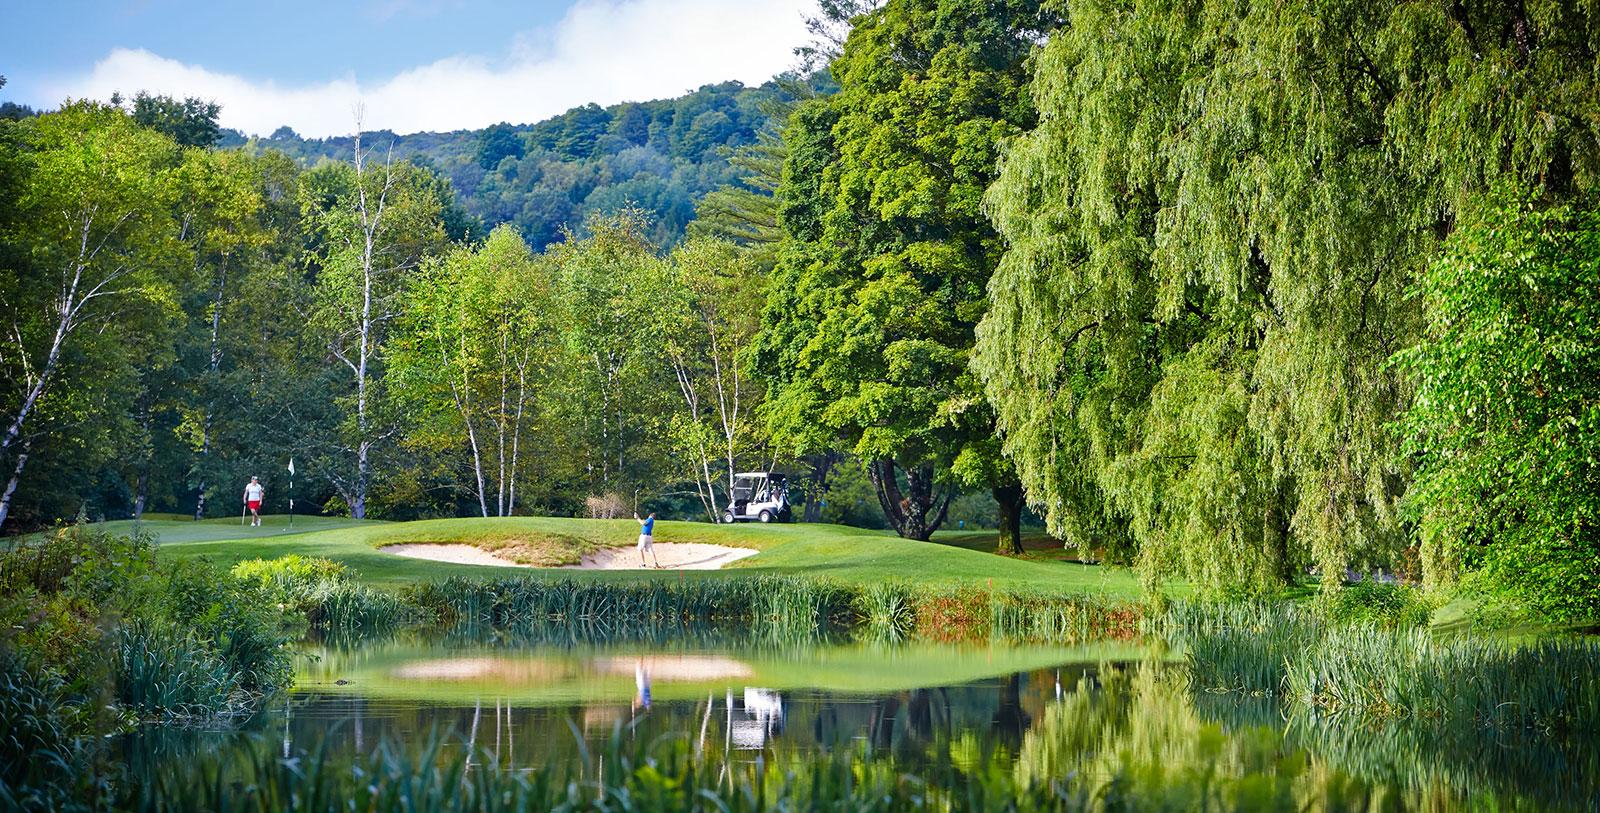 Image of Golf Course Woodstock Inn & Resort, 1793, Member of Historic Hotels of America, in Woodstock, Vermont, Golf